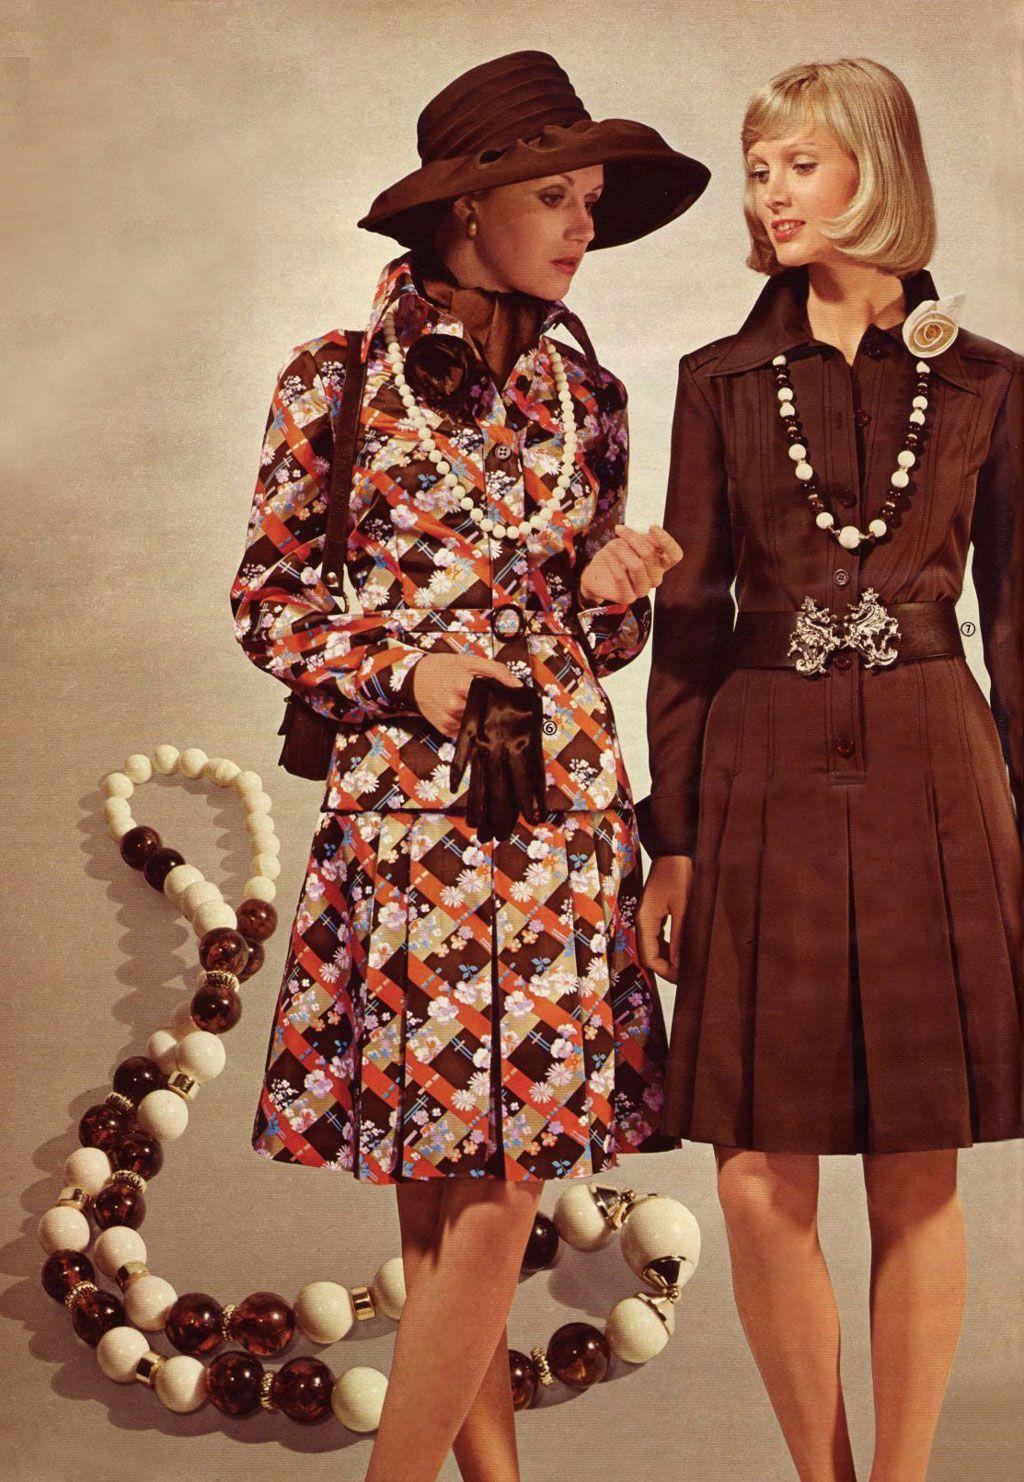 Retro Vintage Style Clothing For Women